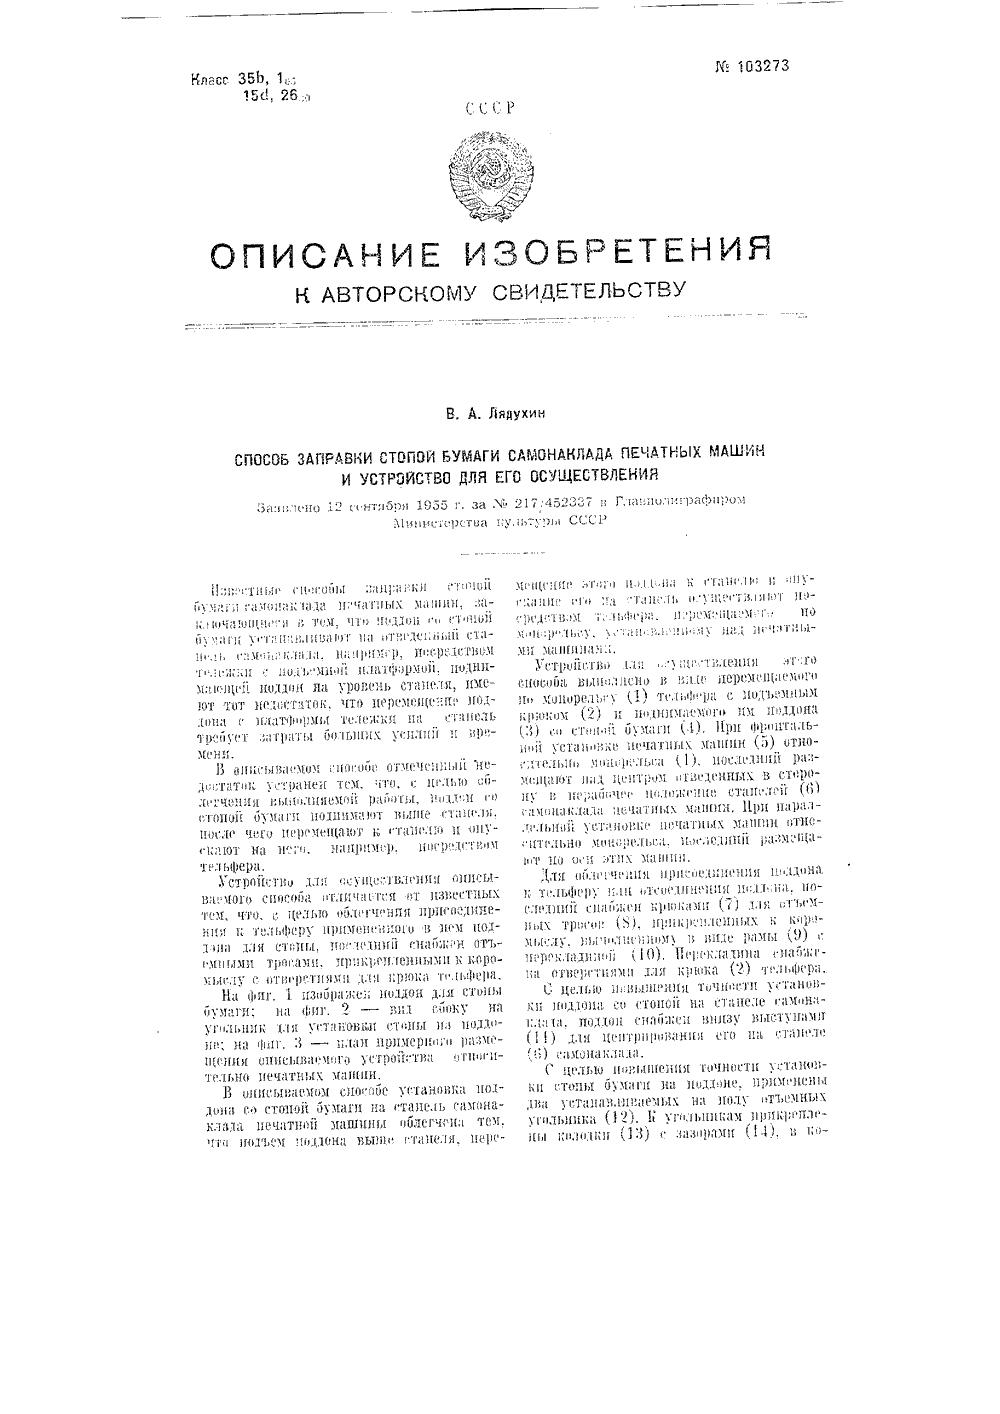 схема устройства лебедки лм-71